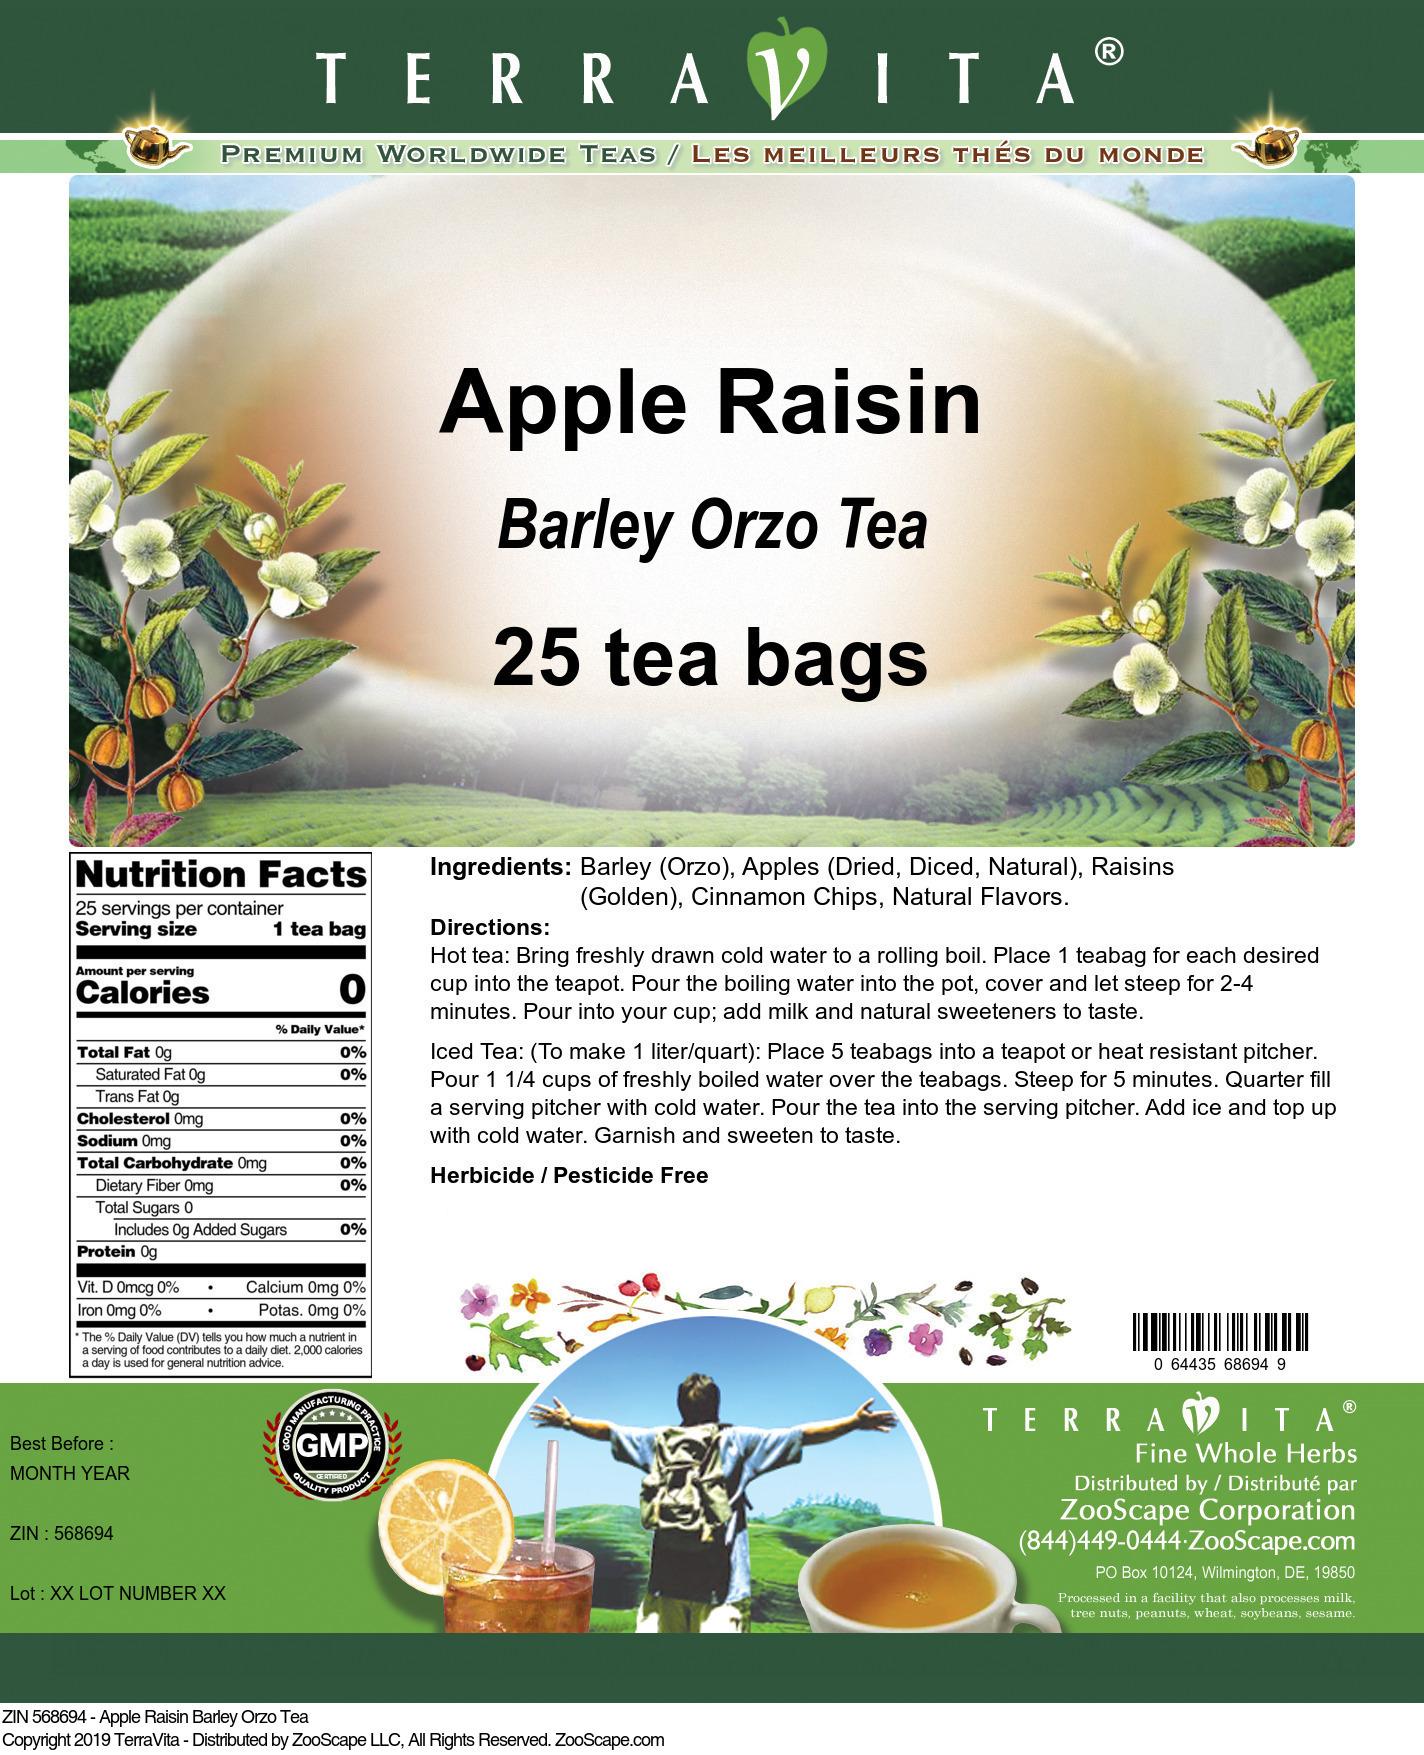 Apple Raisin Barley Orzo